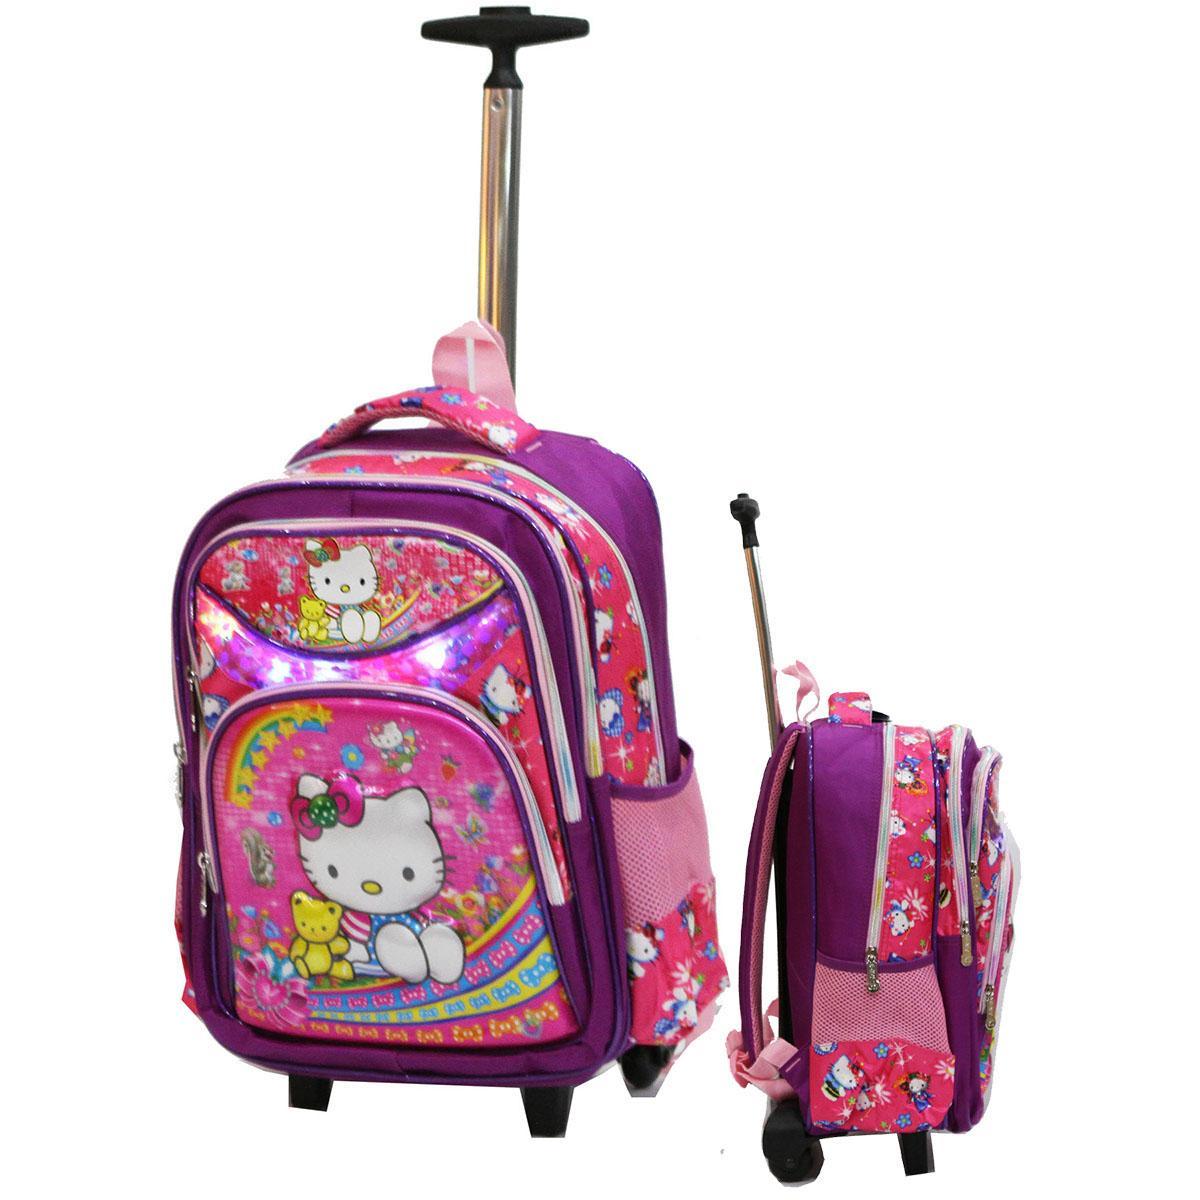 Onlan Hello Kitty 5D Timbul Hologram Tas Trolley Gagang Stainless Stell Ukuran Kantung Besar Import